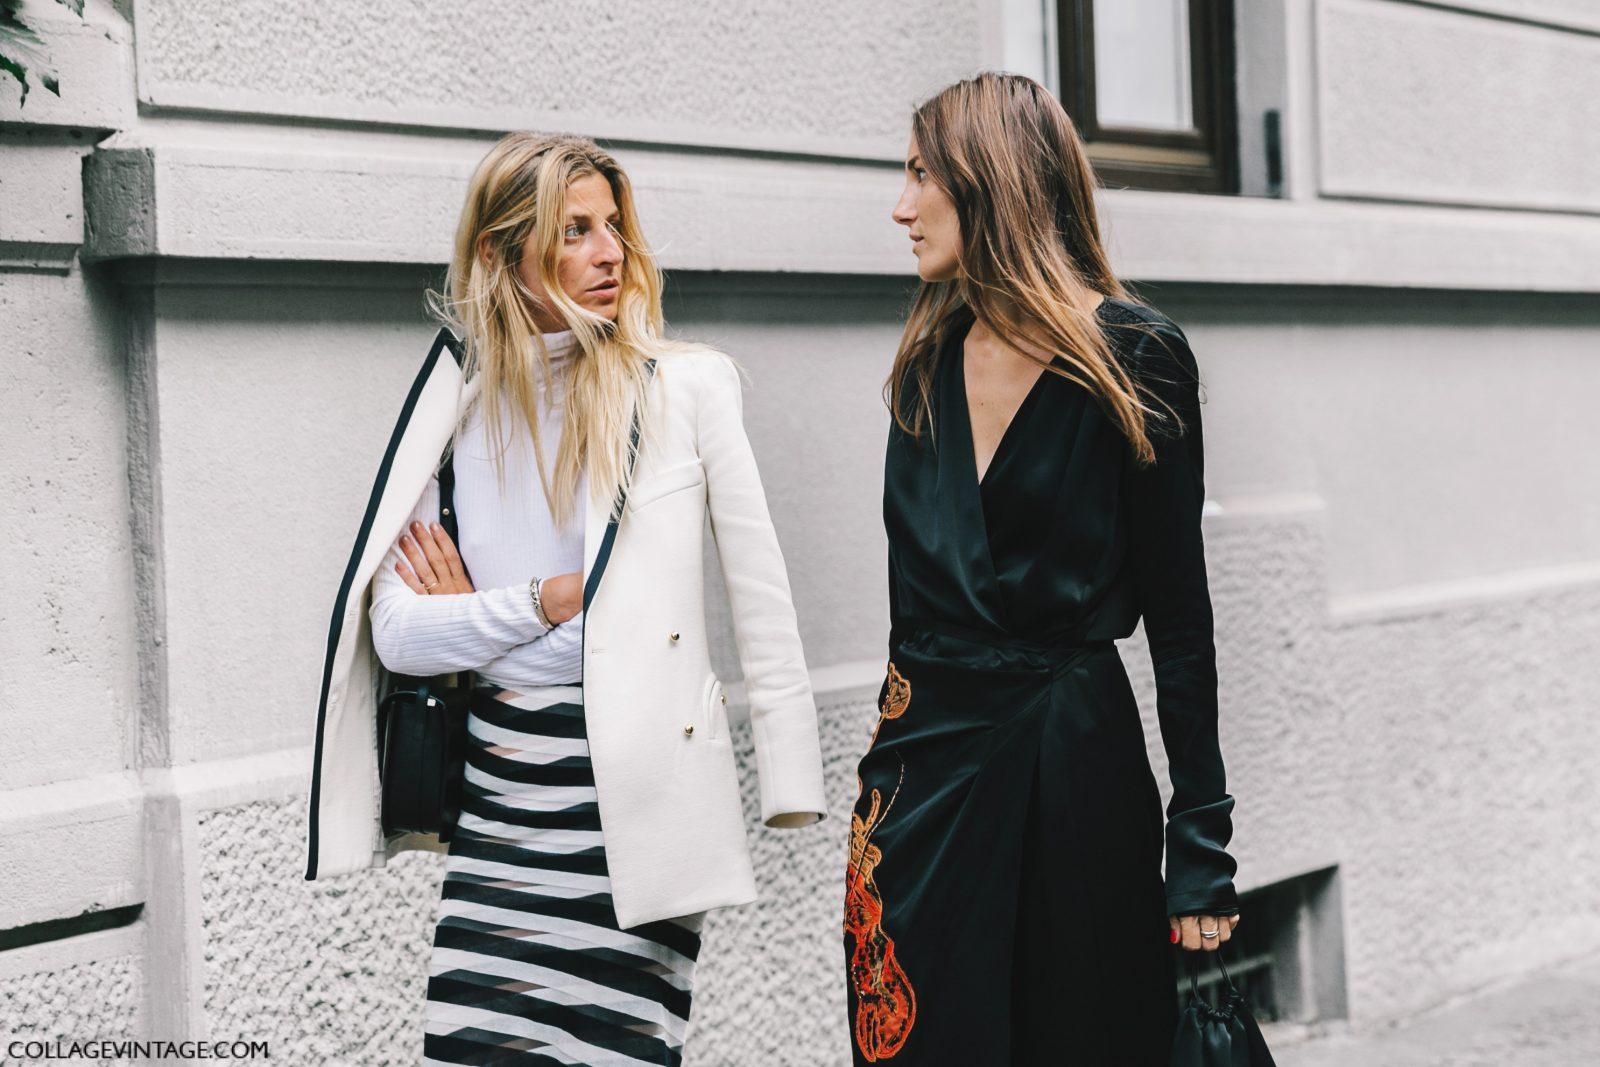 mfw-milan_fashion_week_ss17-street_style-outfits-collage_vintage-gucci-numero_21-alberta_ferreti-10